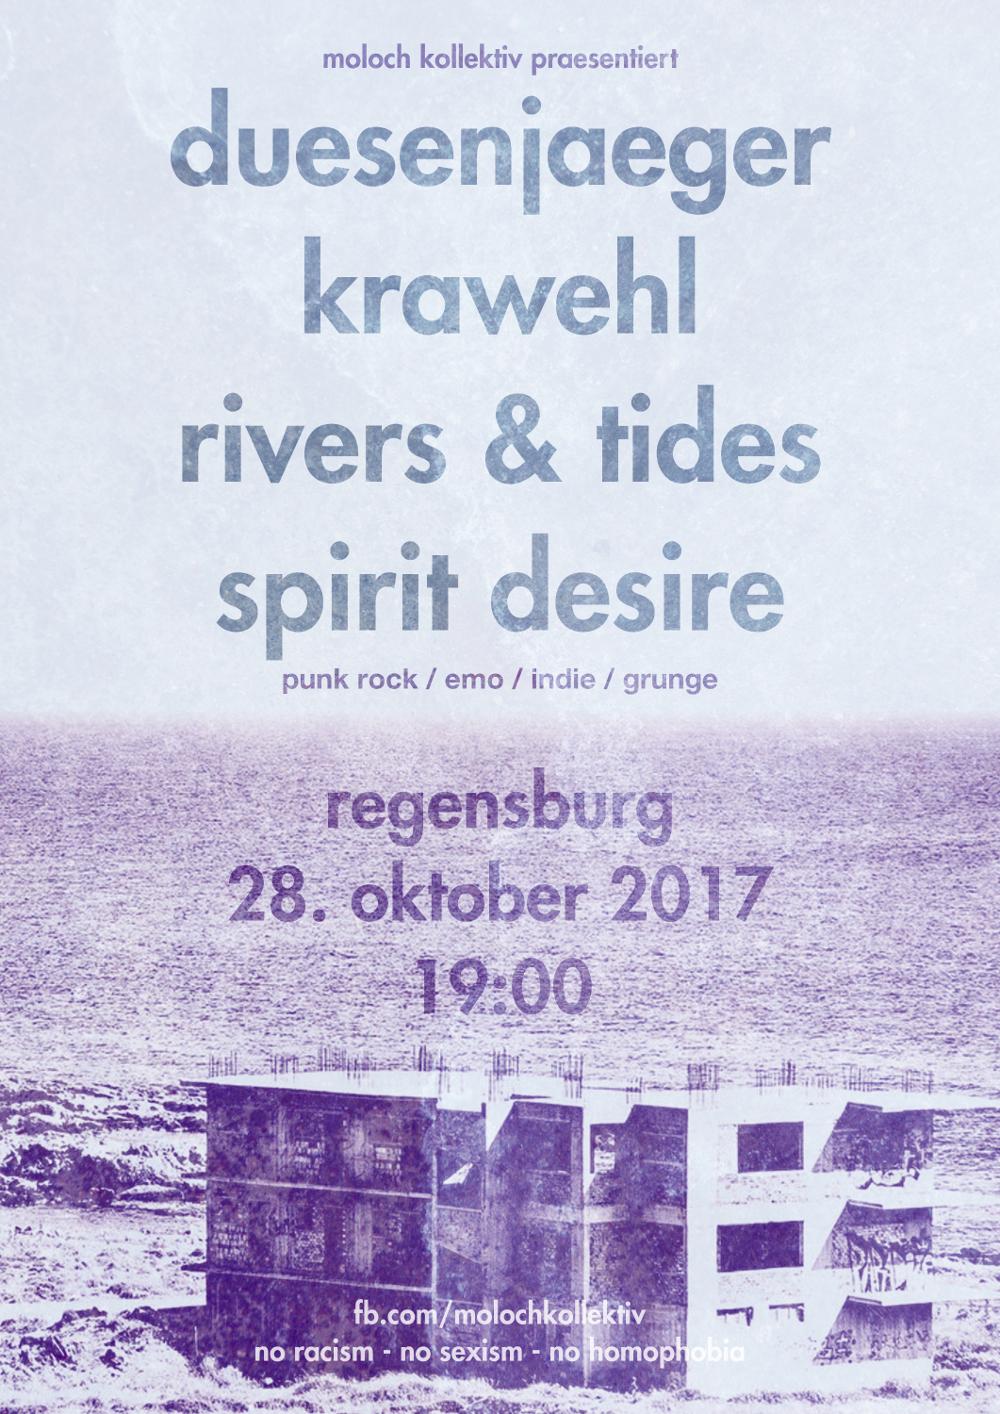 2017-10-29 duesenjaeger + Spirit Desire + Rivers & Tides + Krawehl Flyer